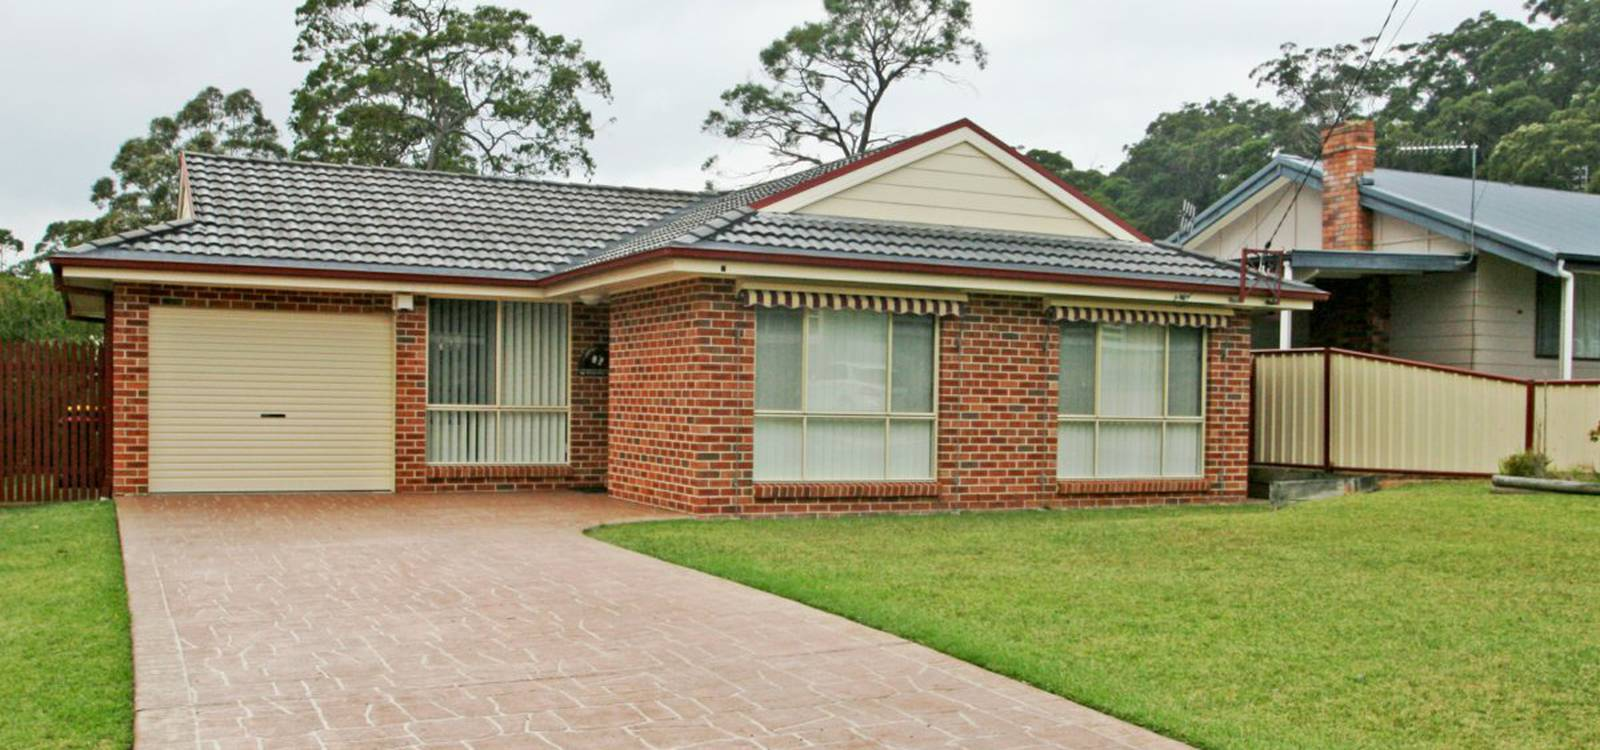 8 Wildwood Avenue SUSSEX INLET, NSW 2540 - photo 1